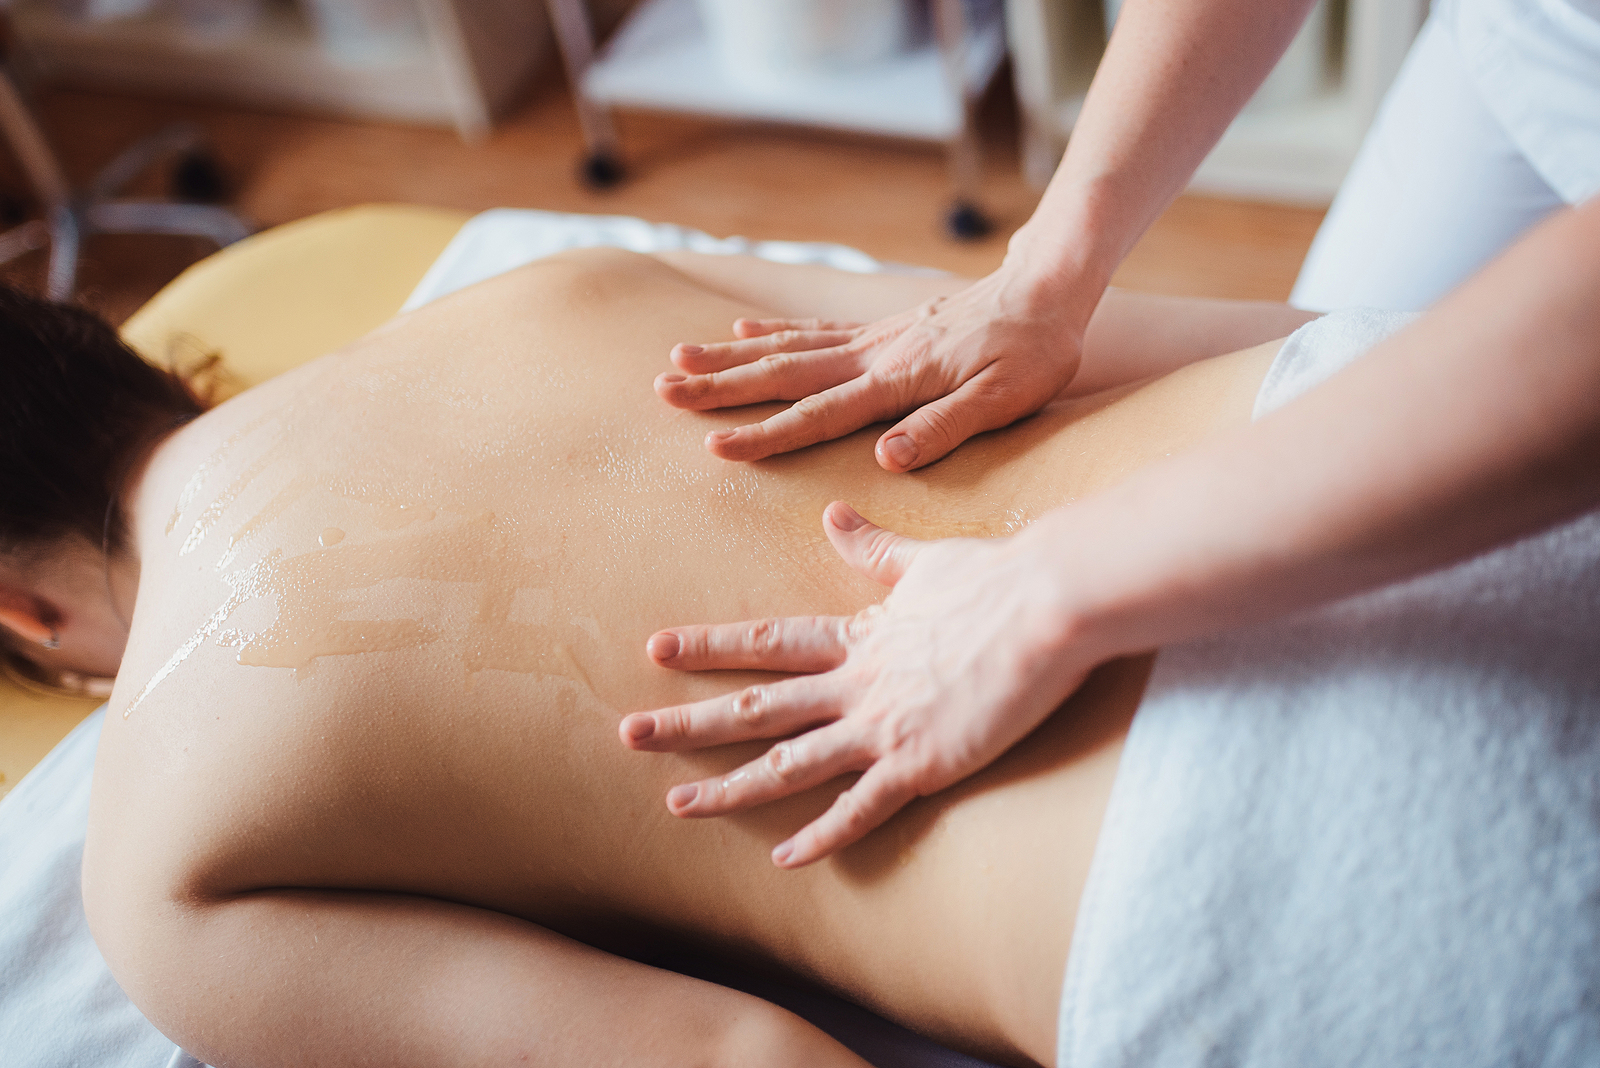 bigstock-Woman-Having-Spa-Body-Massage--258518500.jpg